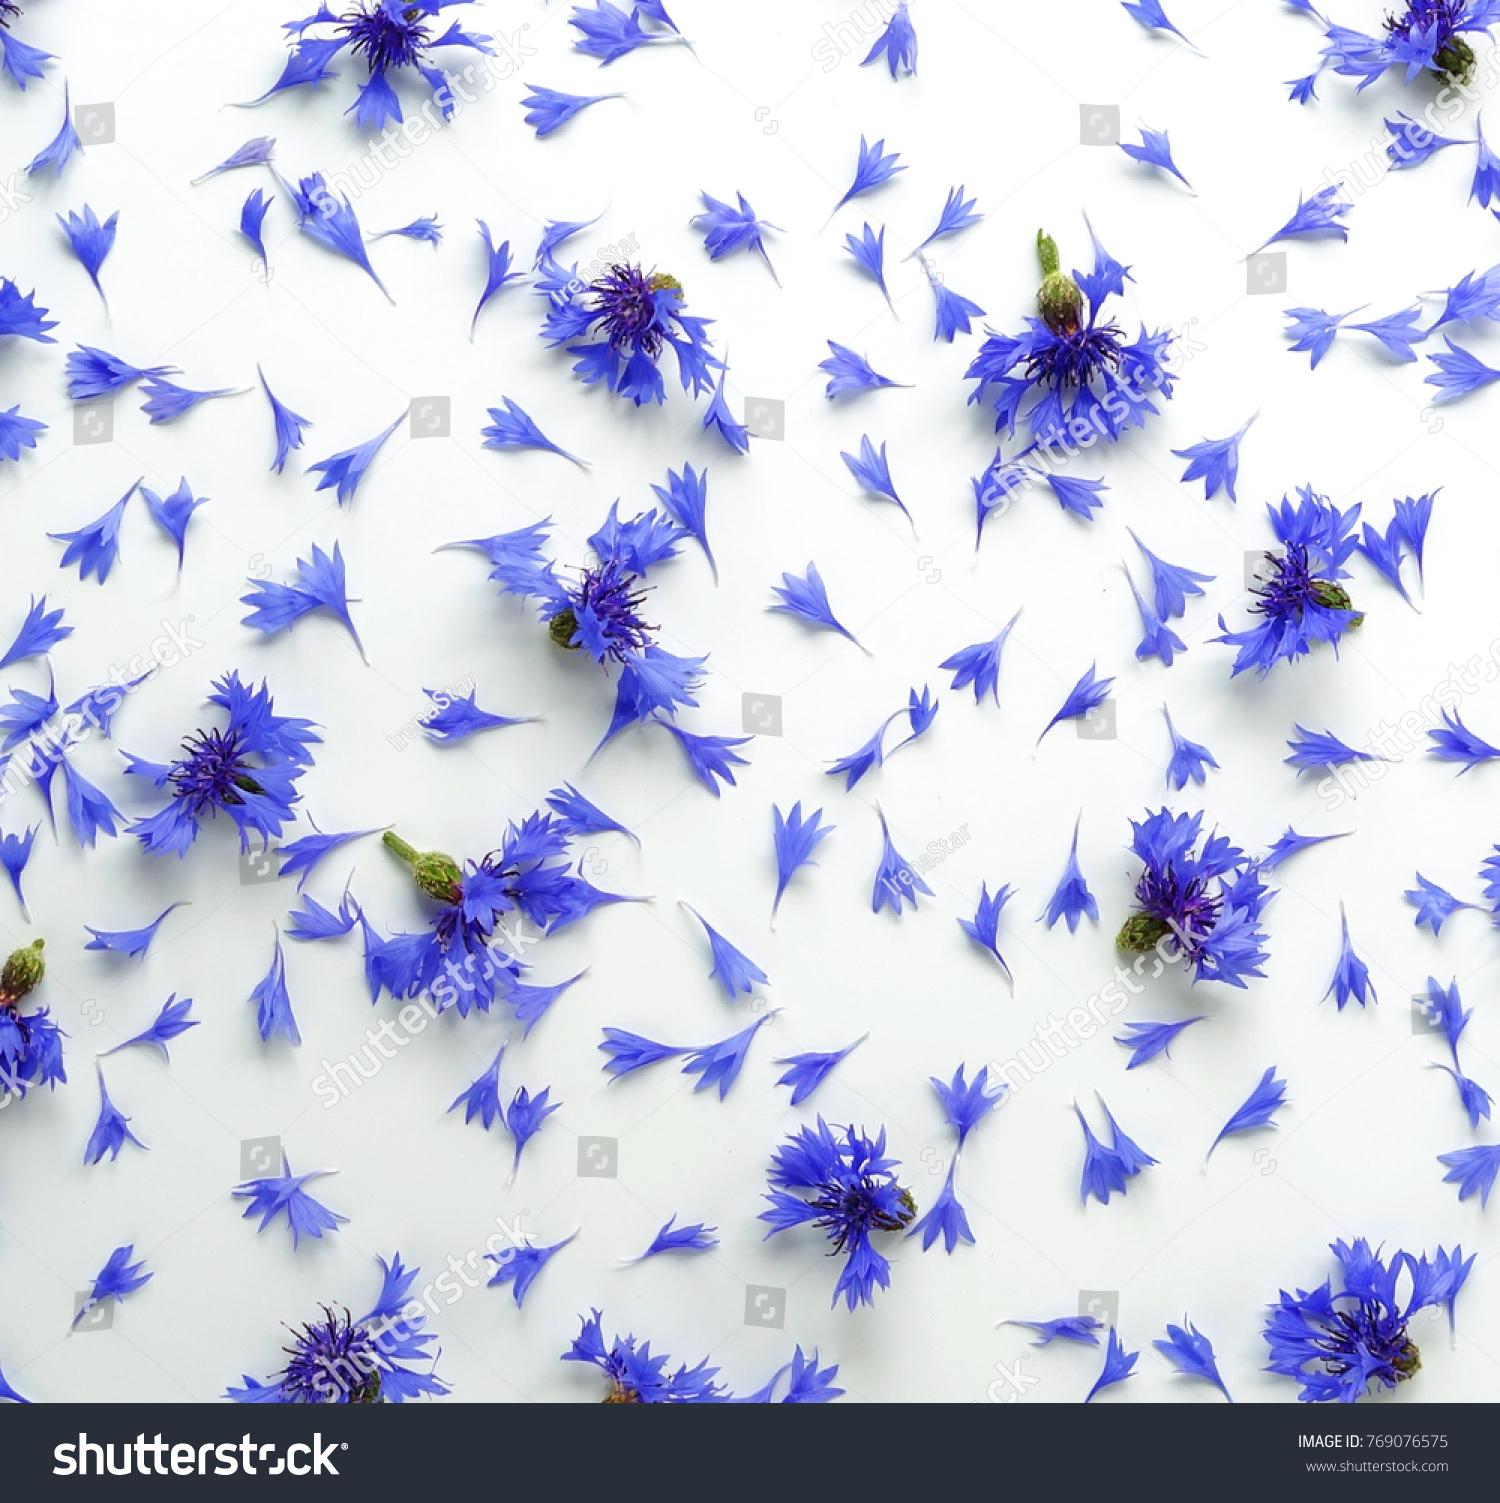 Blue Flowers Cornflowers Pattern On White Stock Photo Royalty Free